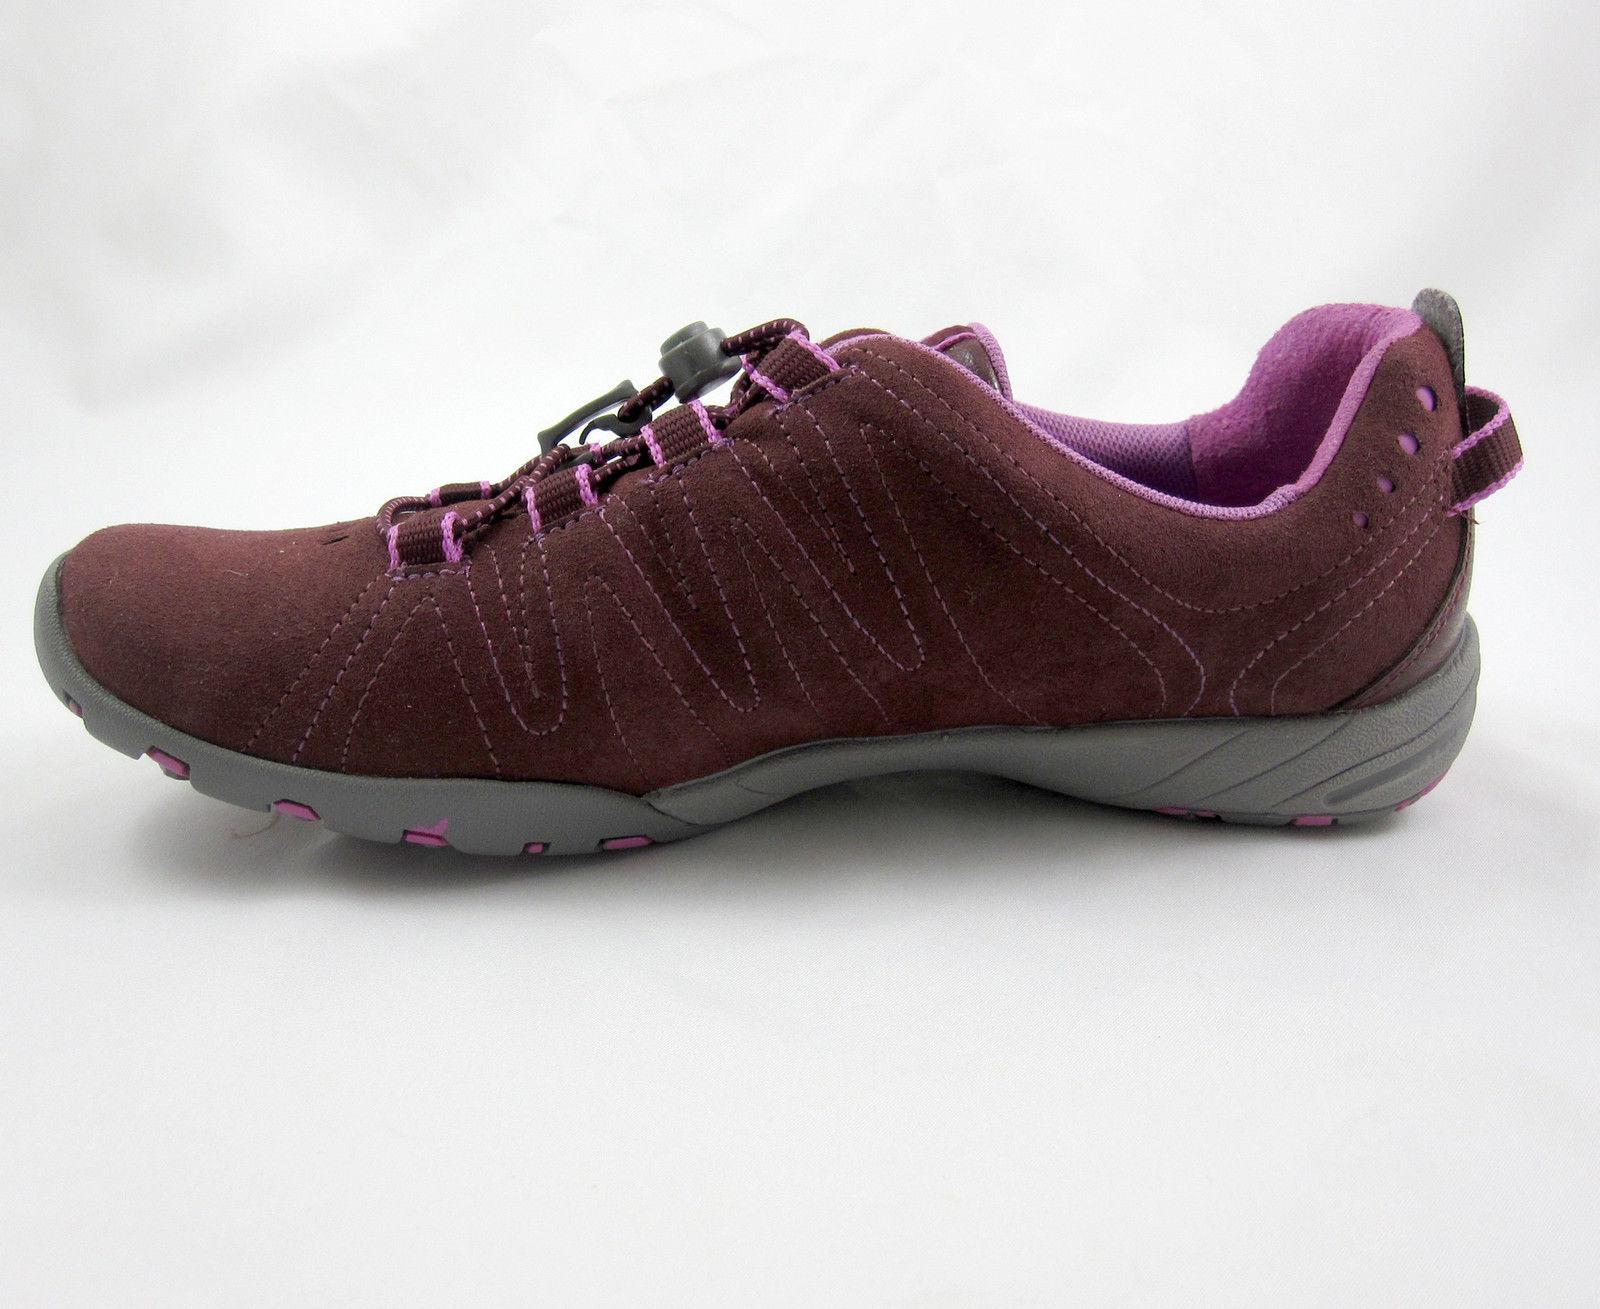 Clarks Privo Sprint Xenon Sz 6 Pink Berry Walking Shoes Vegan Synthetic Comfort